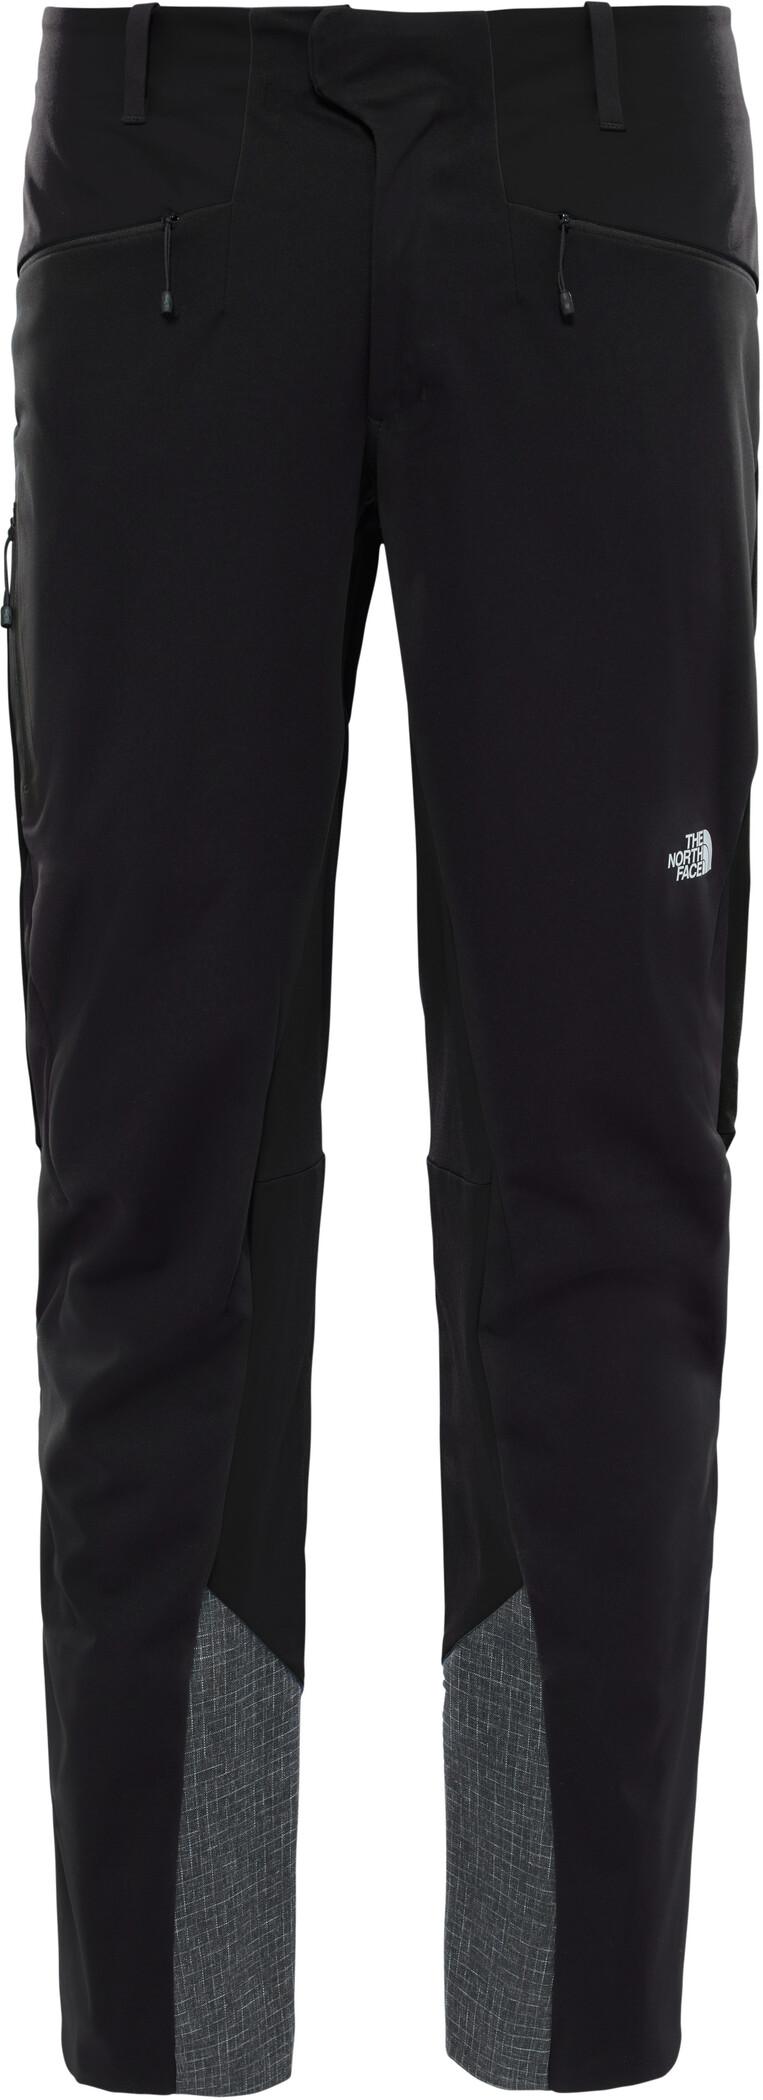 The North Face Byxor & Shorts – stort utbud  